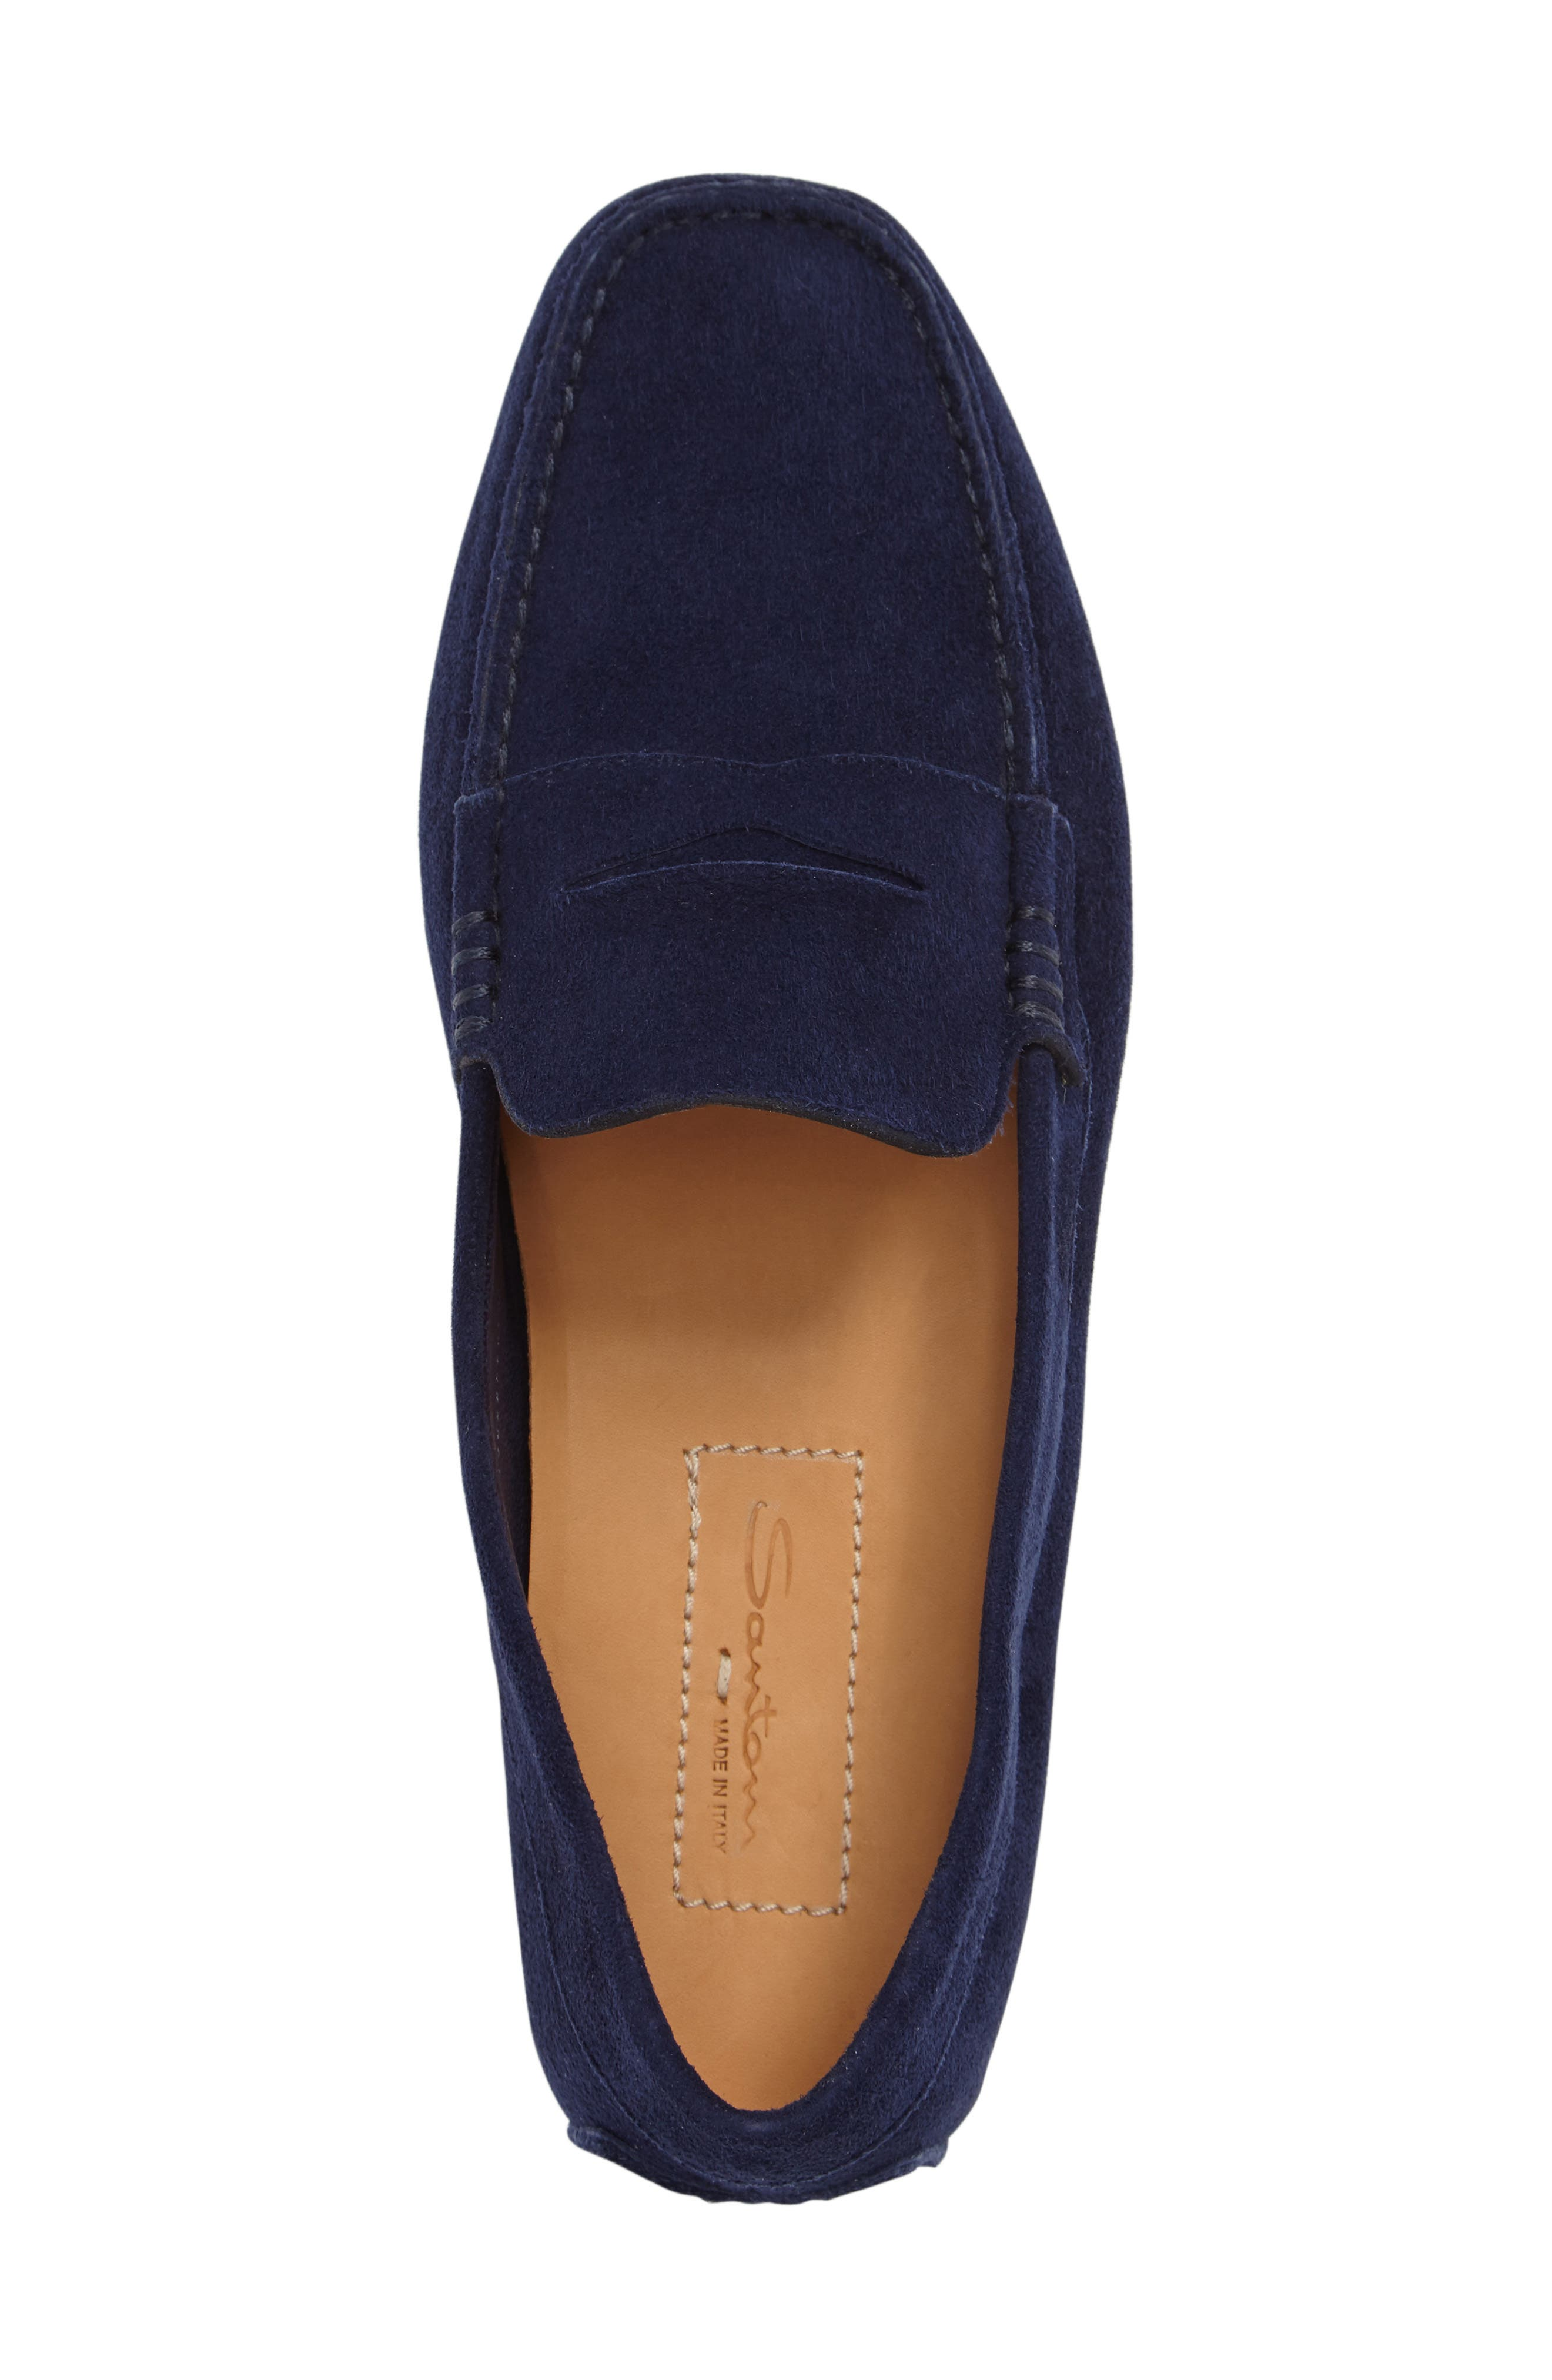 Alternate Image 3  - Santoni 'Tanton' Driving Shoe